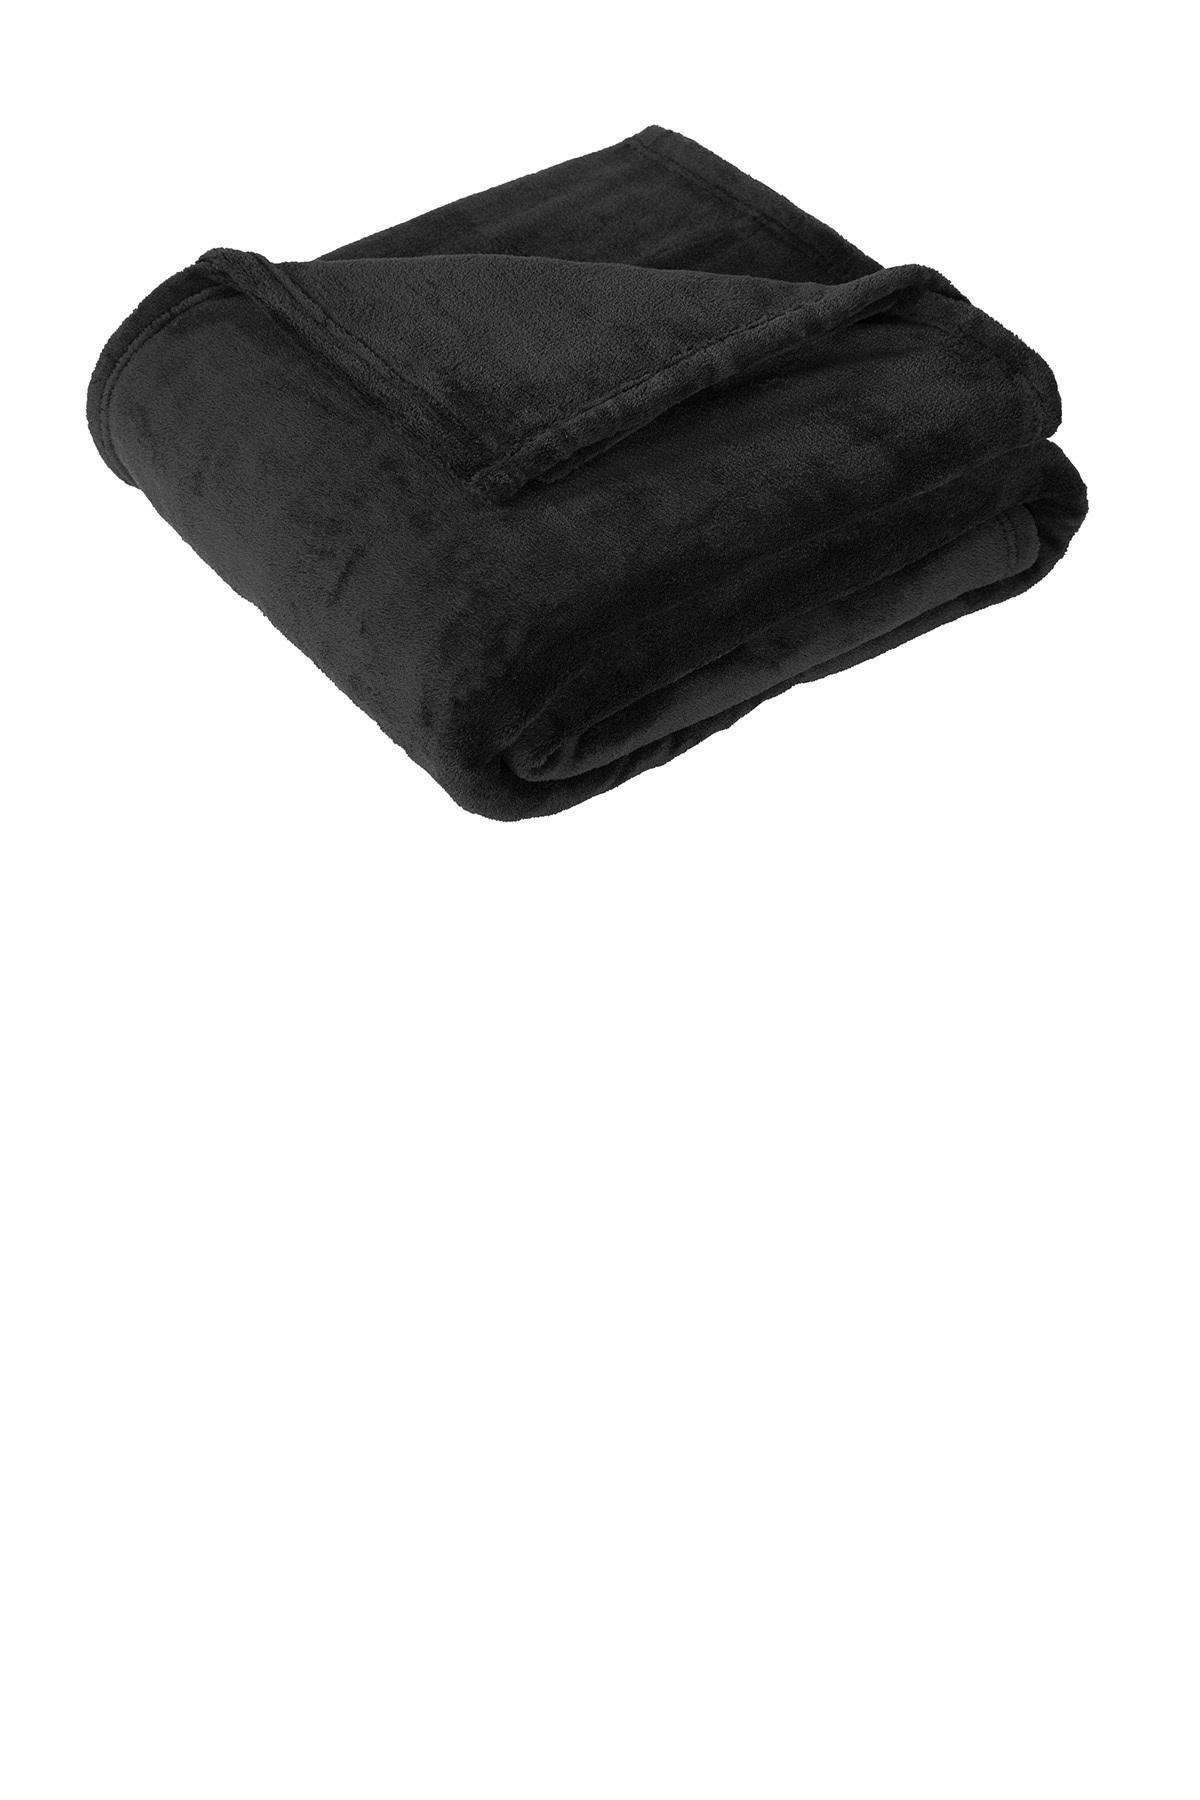 Port Authority® - BP32 - Oversized Ultra Plush Blanket